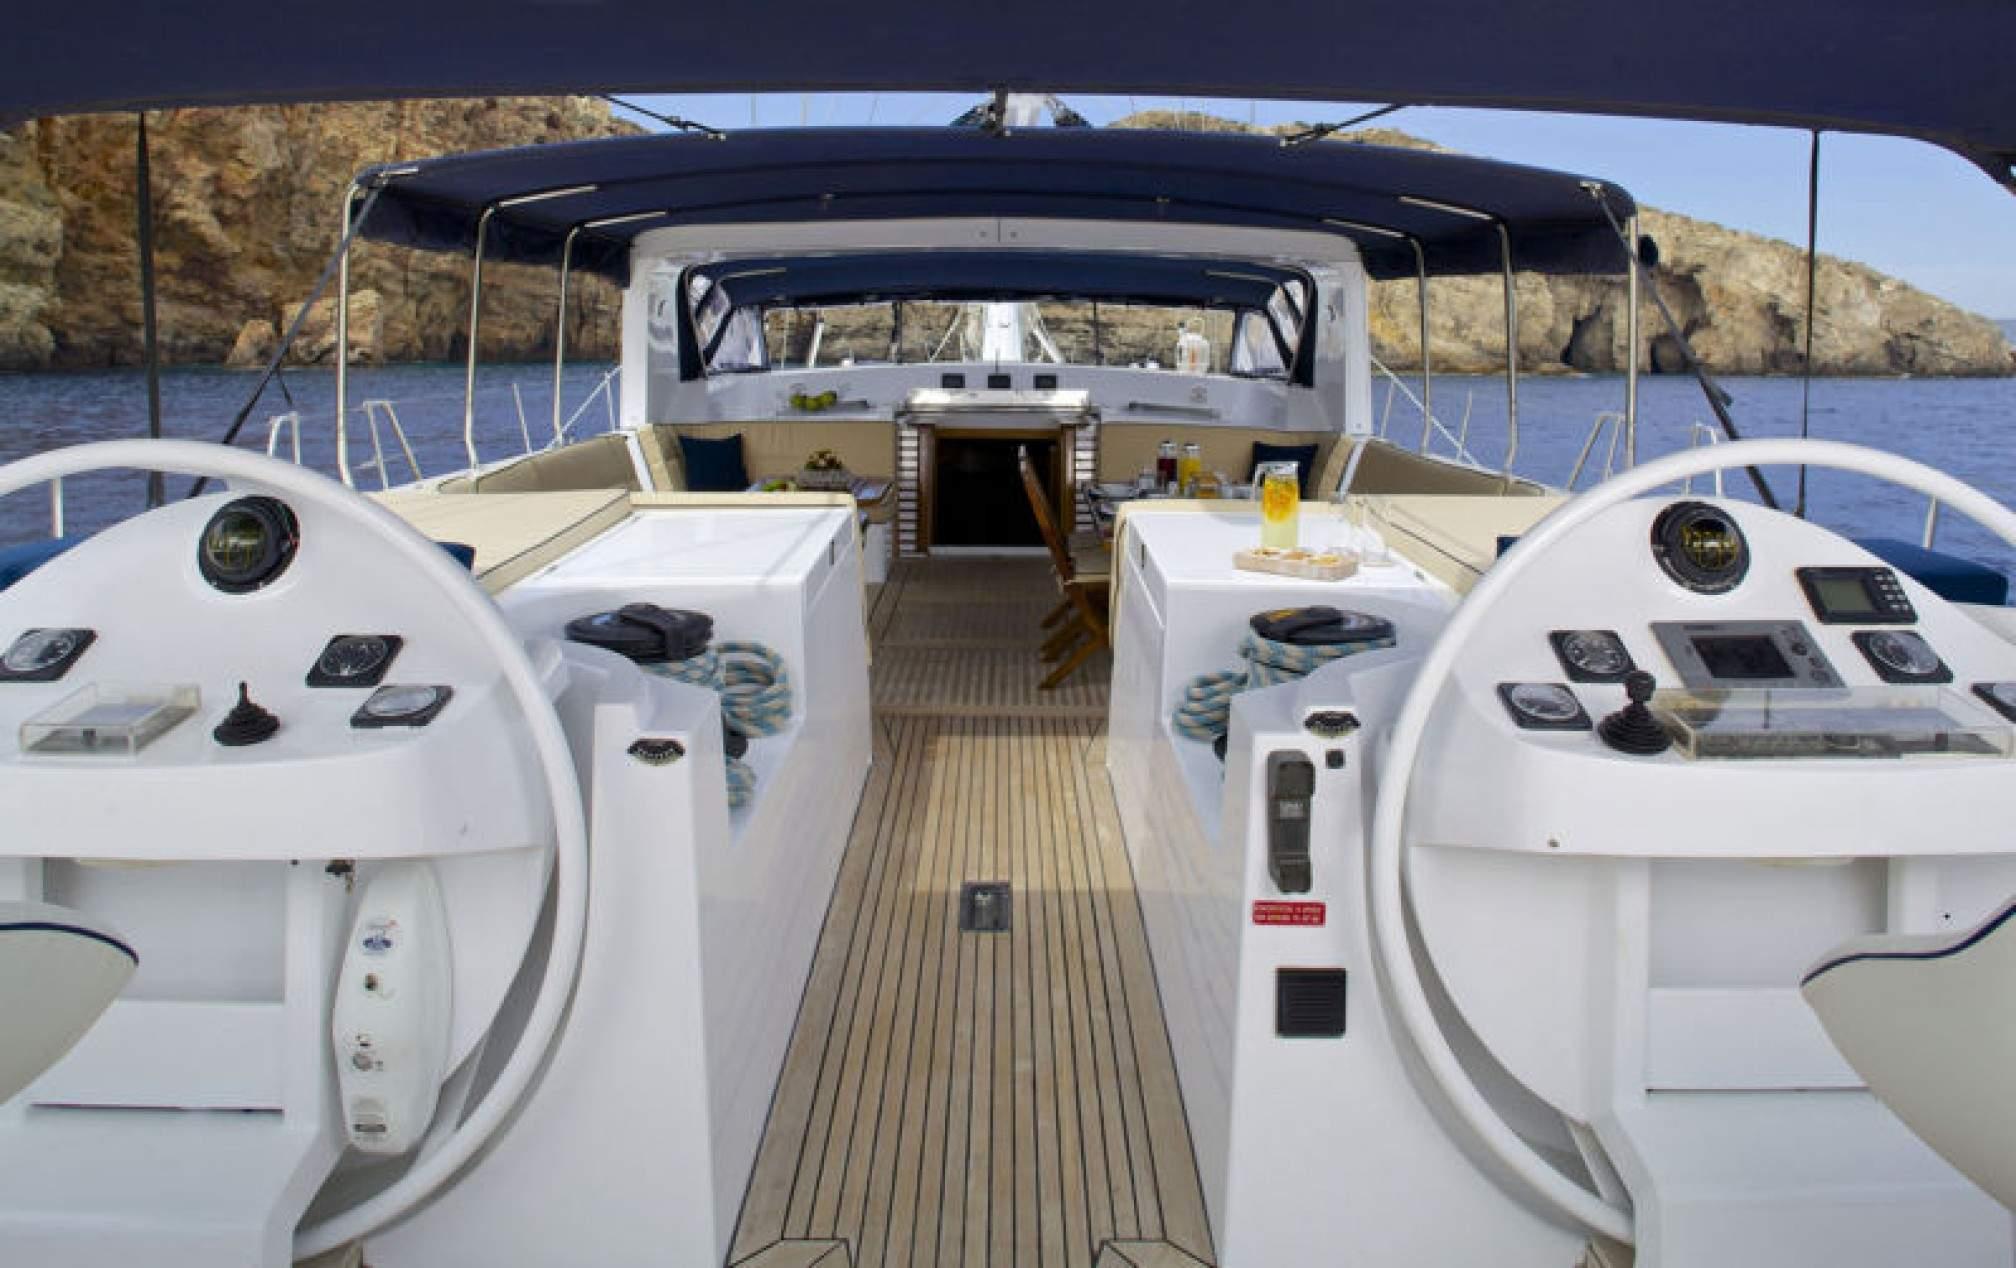 Rental yacht AMADEUS deck